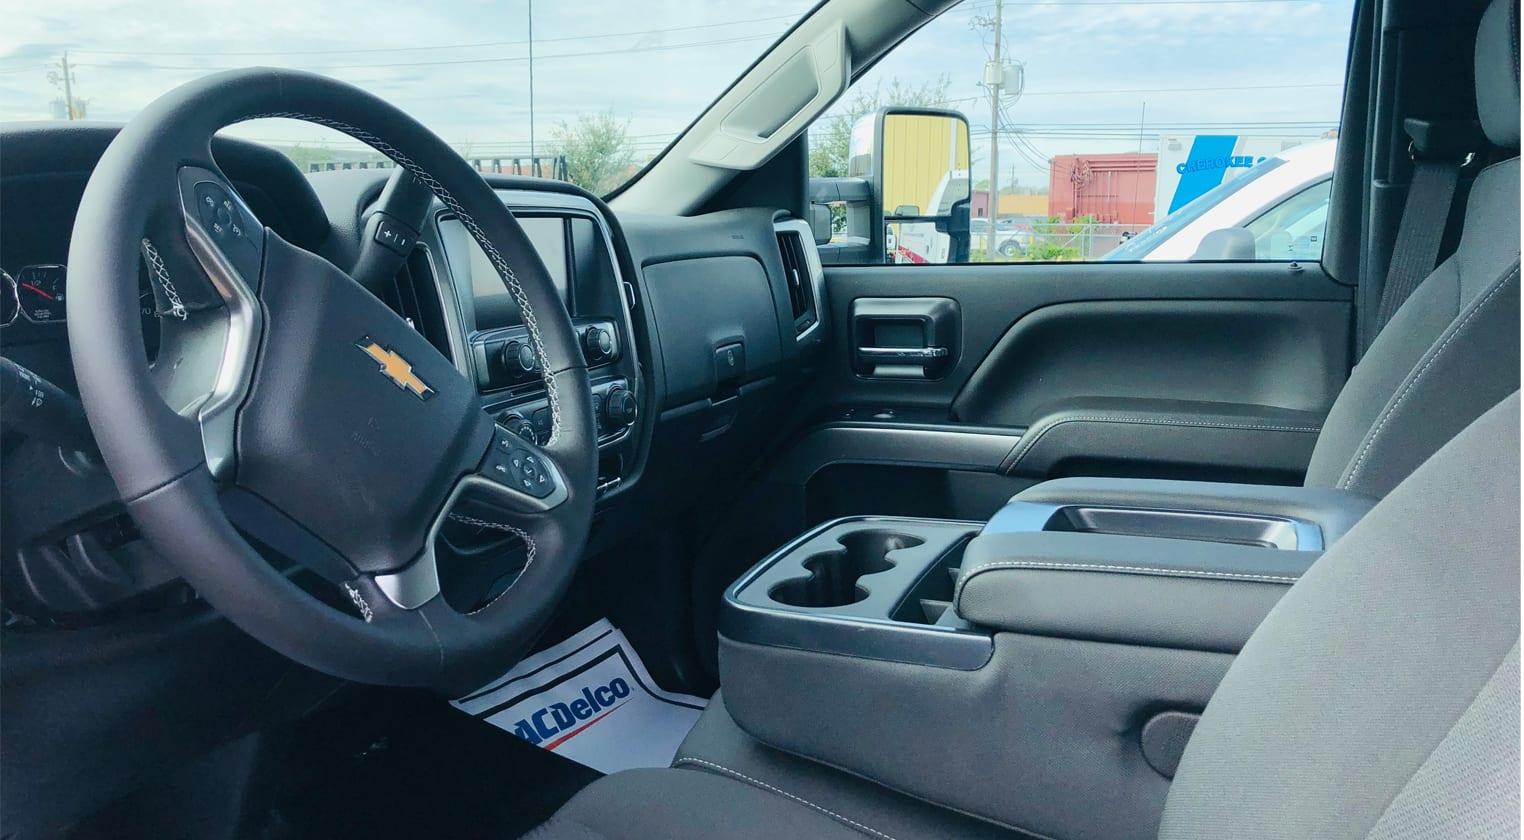 9.Chevy4500HD.Ambulance.Truck.Chassis